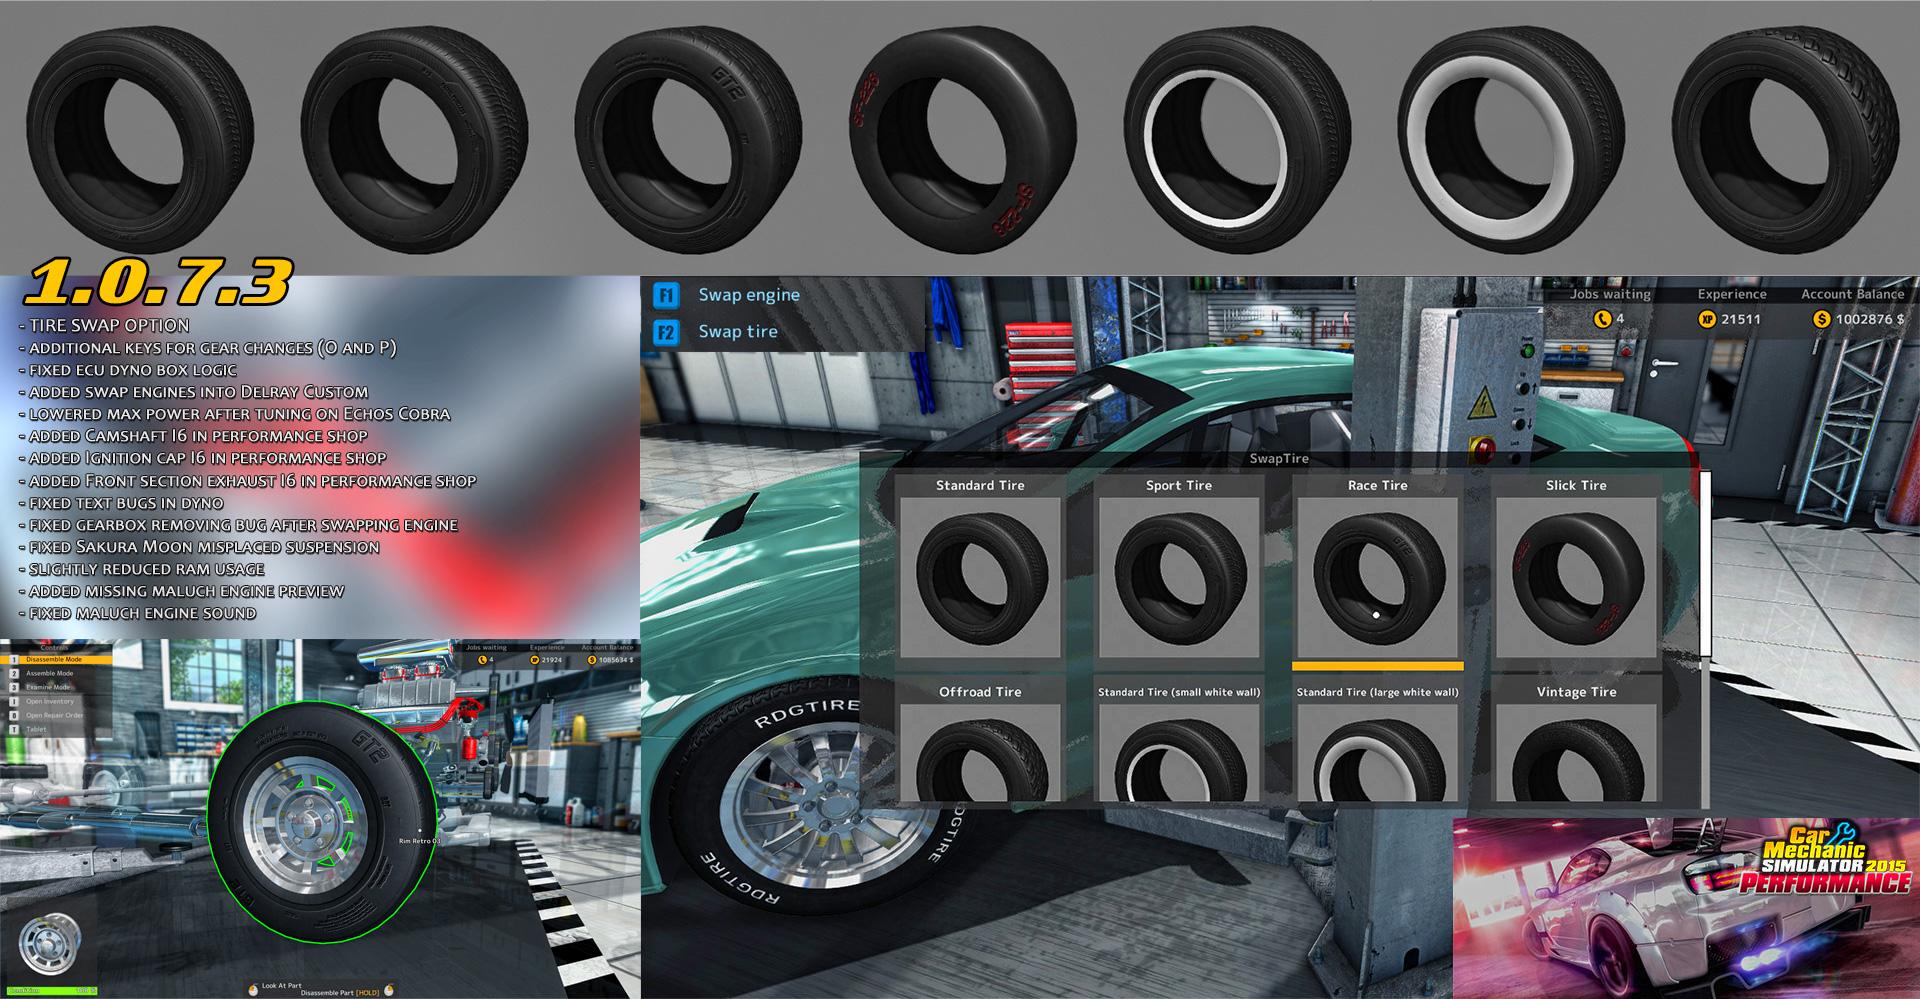 Car Mechanic Simulator 2015 Mods >> May 16 2016 Tire Swap Update 1 0 7 3 Car Mechanic